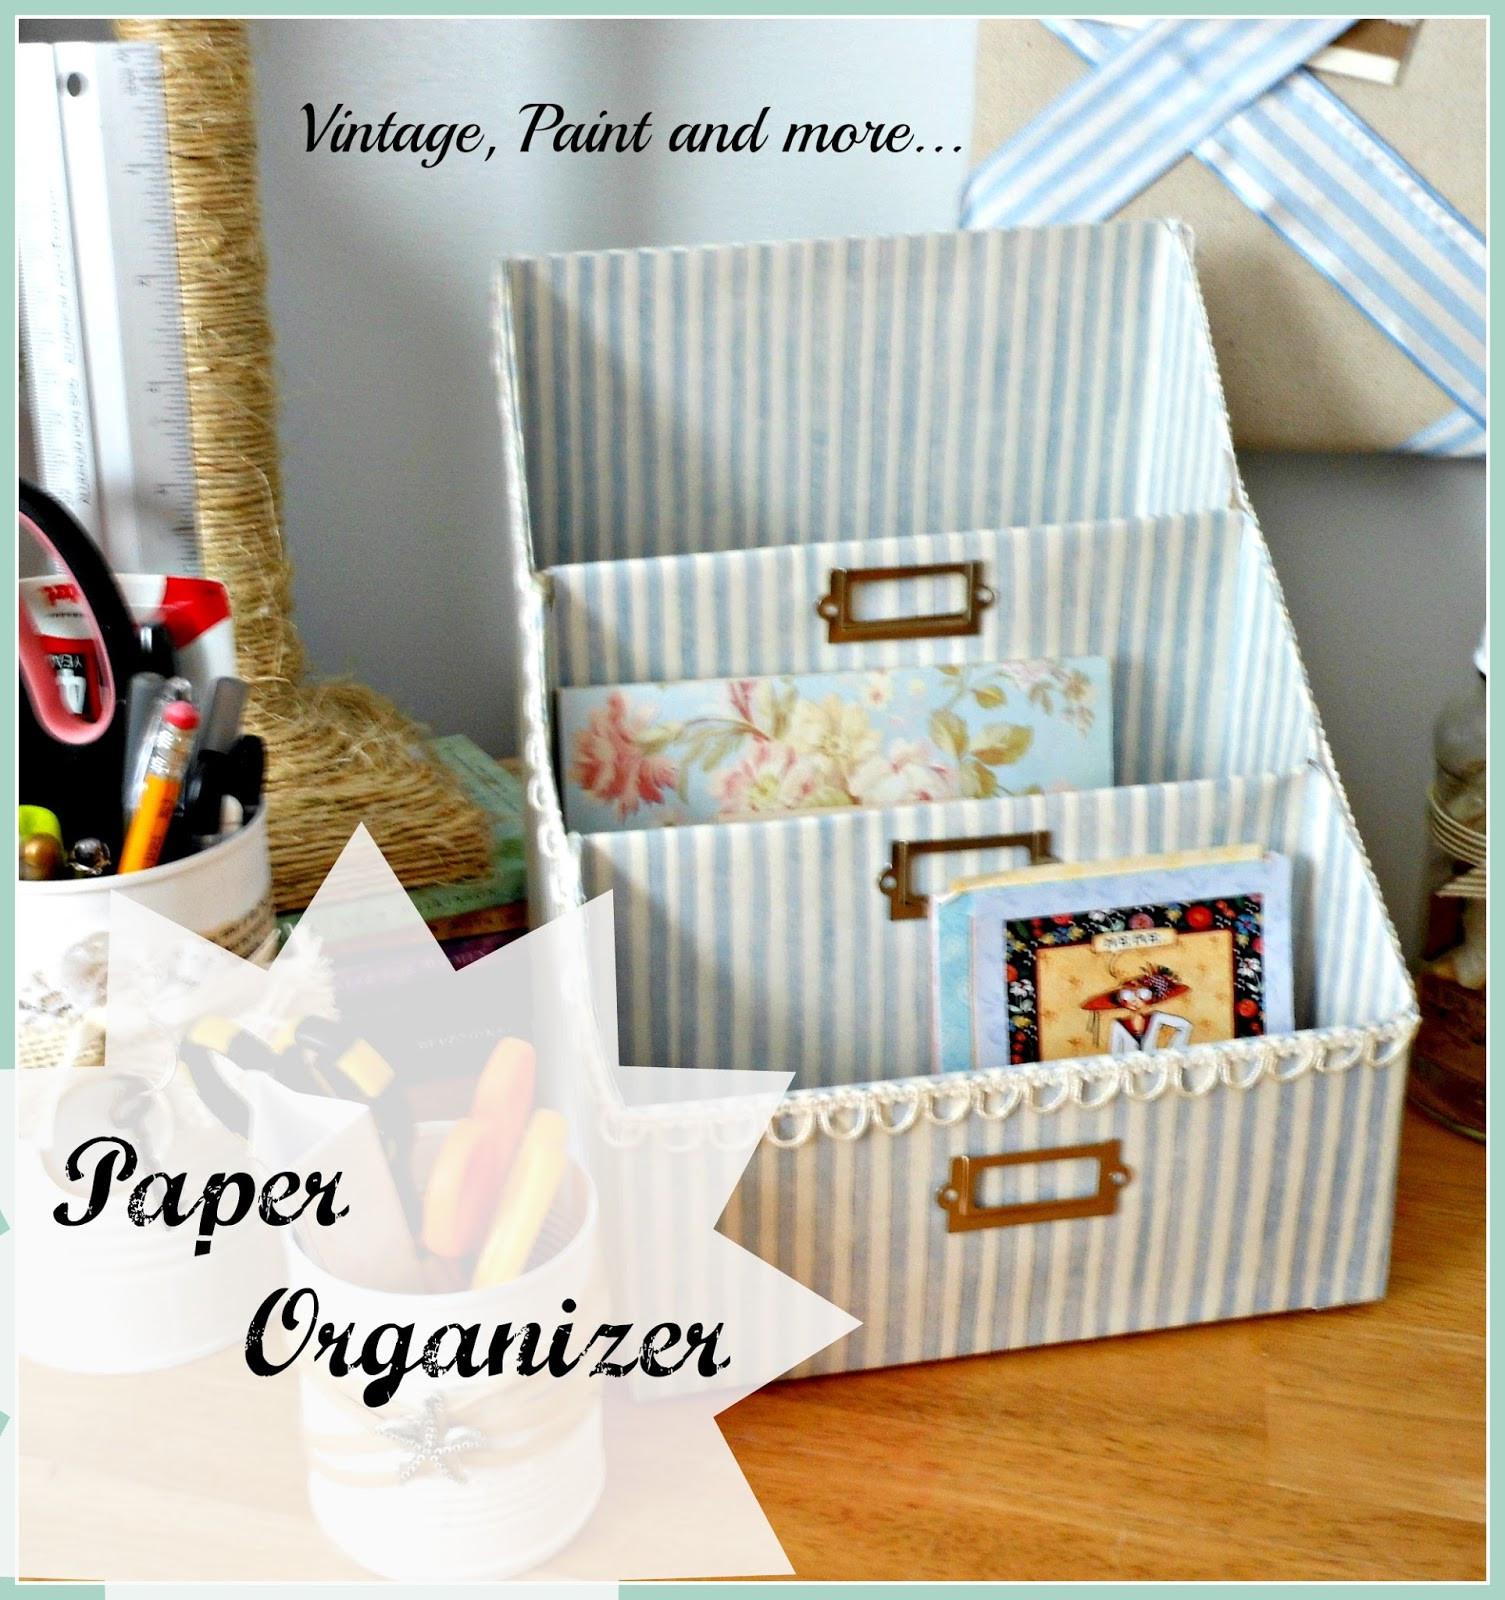 Paper Organizer DIY  Day 7 Organizing Paperwork 31 Cheap & Easy DIY